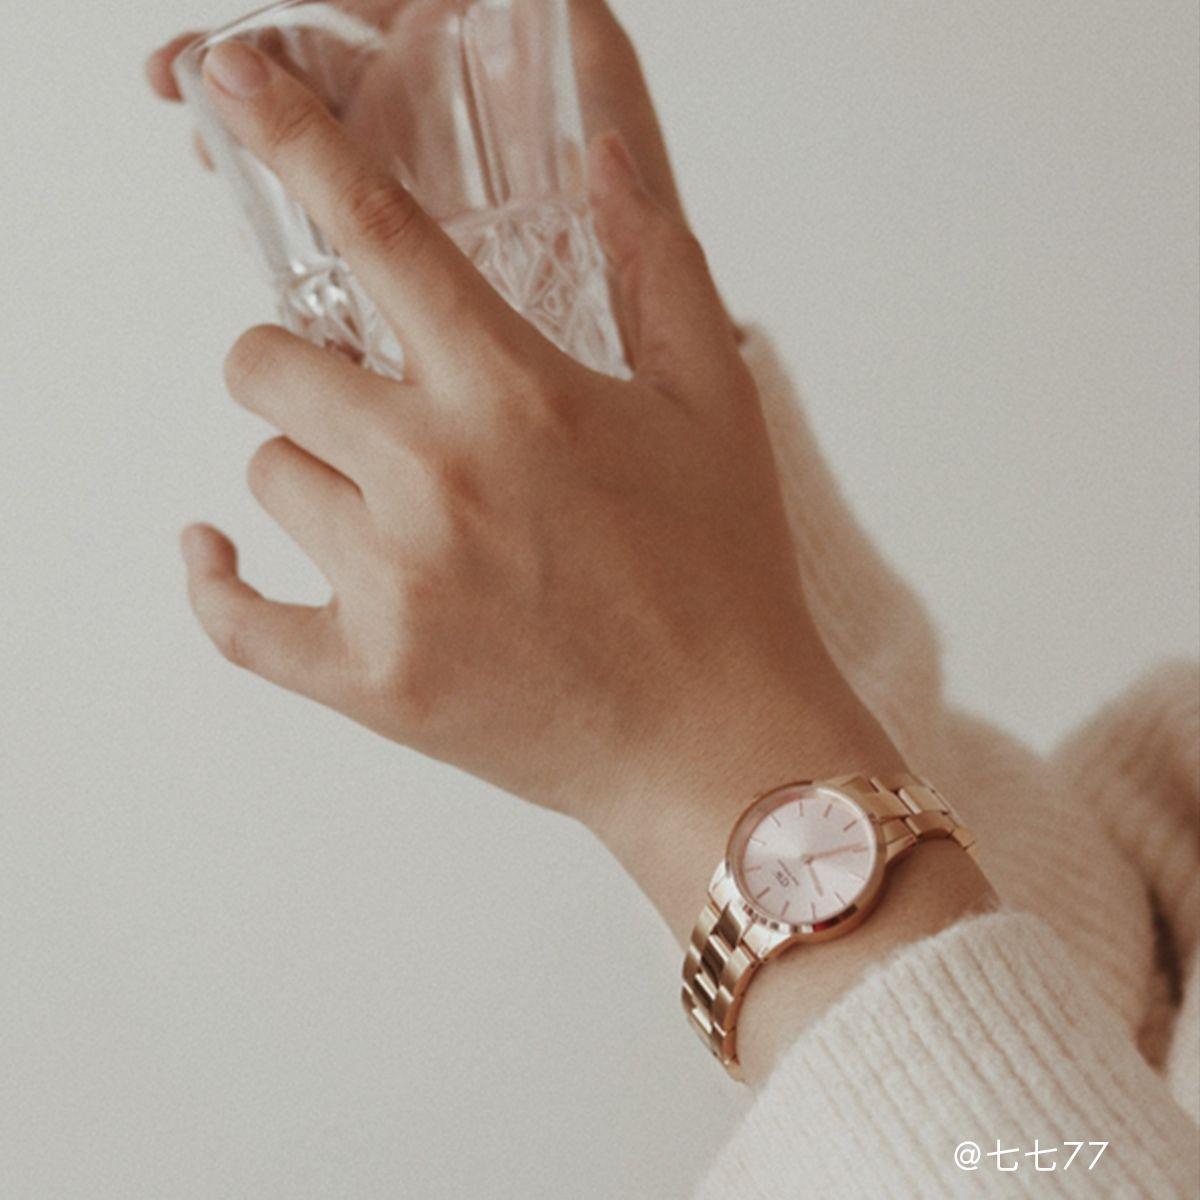 dw官网 dw手表官网 dw中国官网 dw官方旗舰店 DW DW官网  Watch Iconic Link RG Pink 36mm